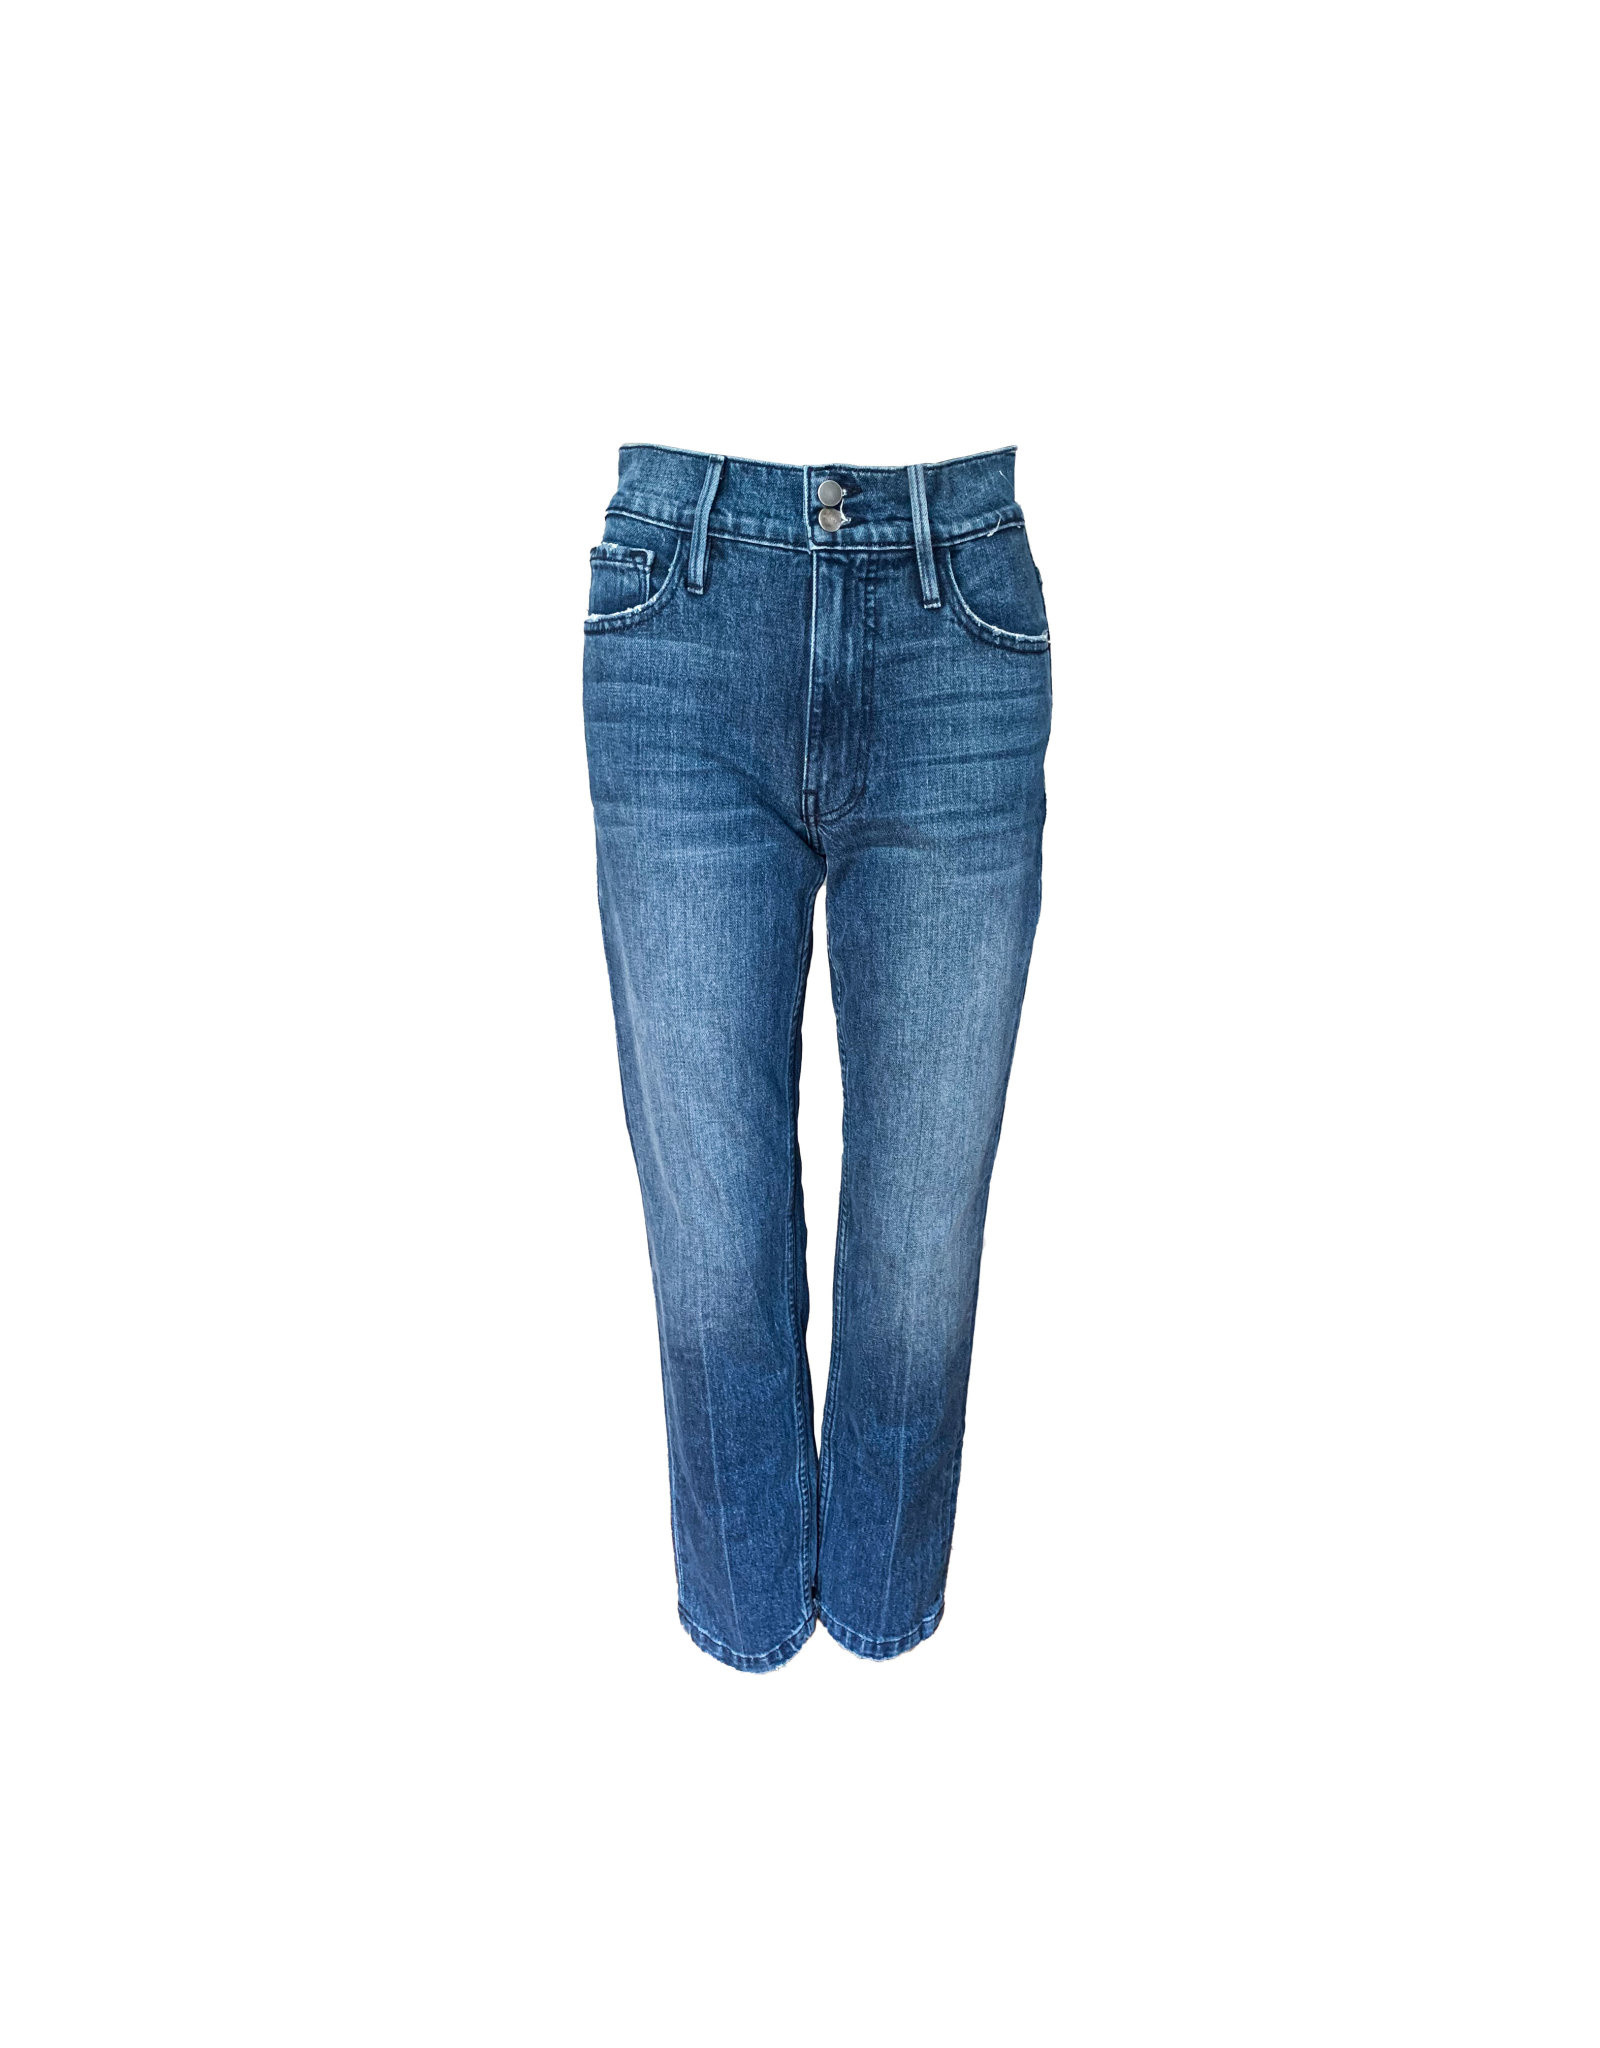 Frame FRAME Heritage Denim, A Slender Straight-Leg Size 25